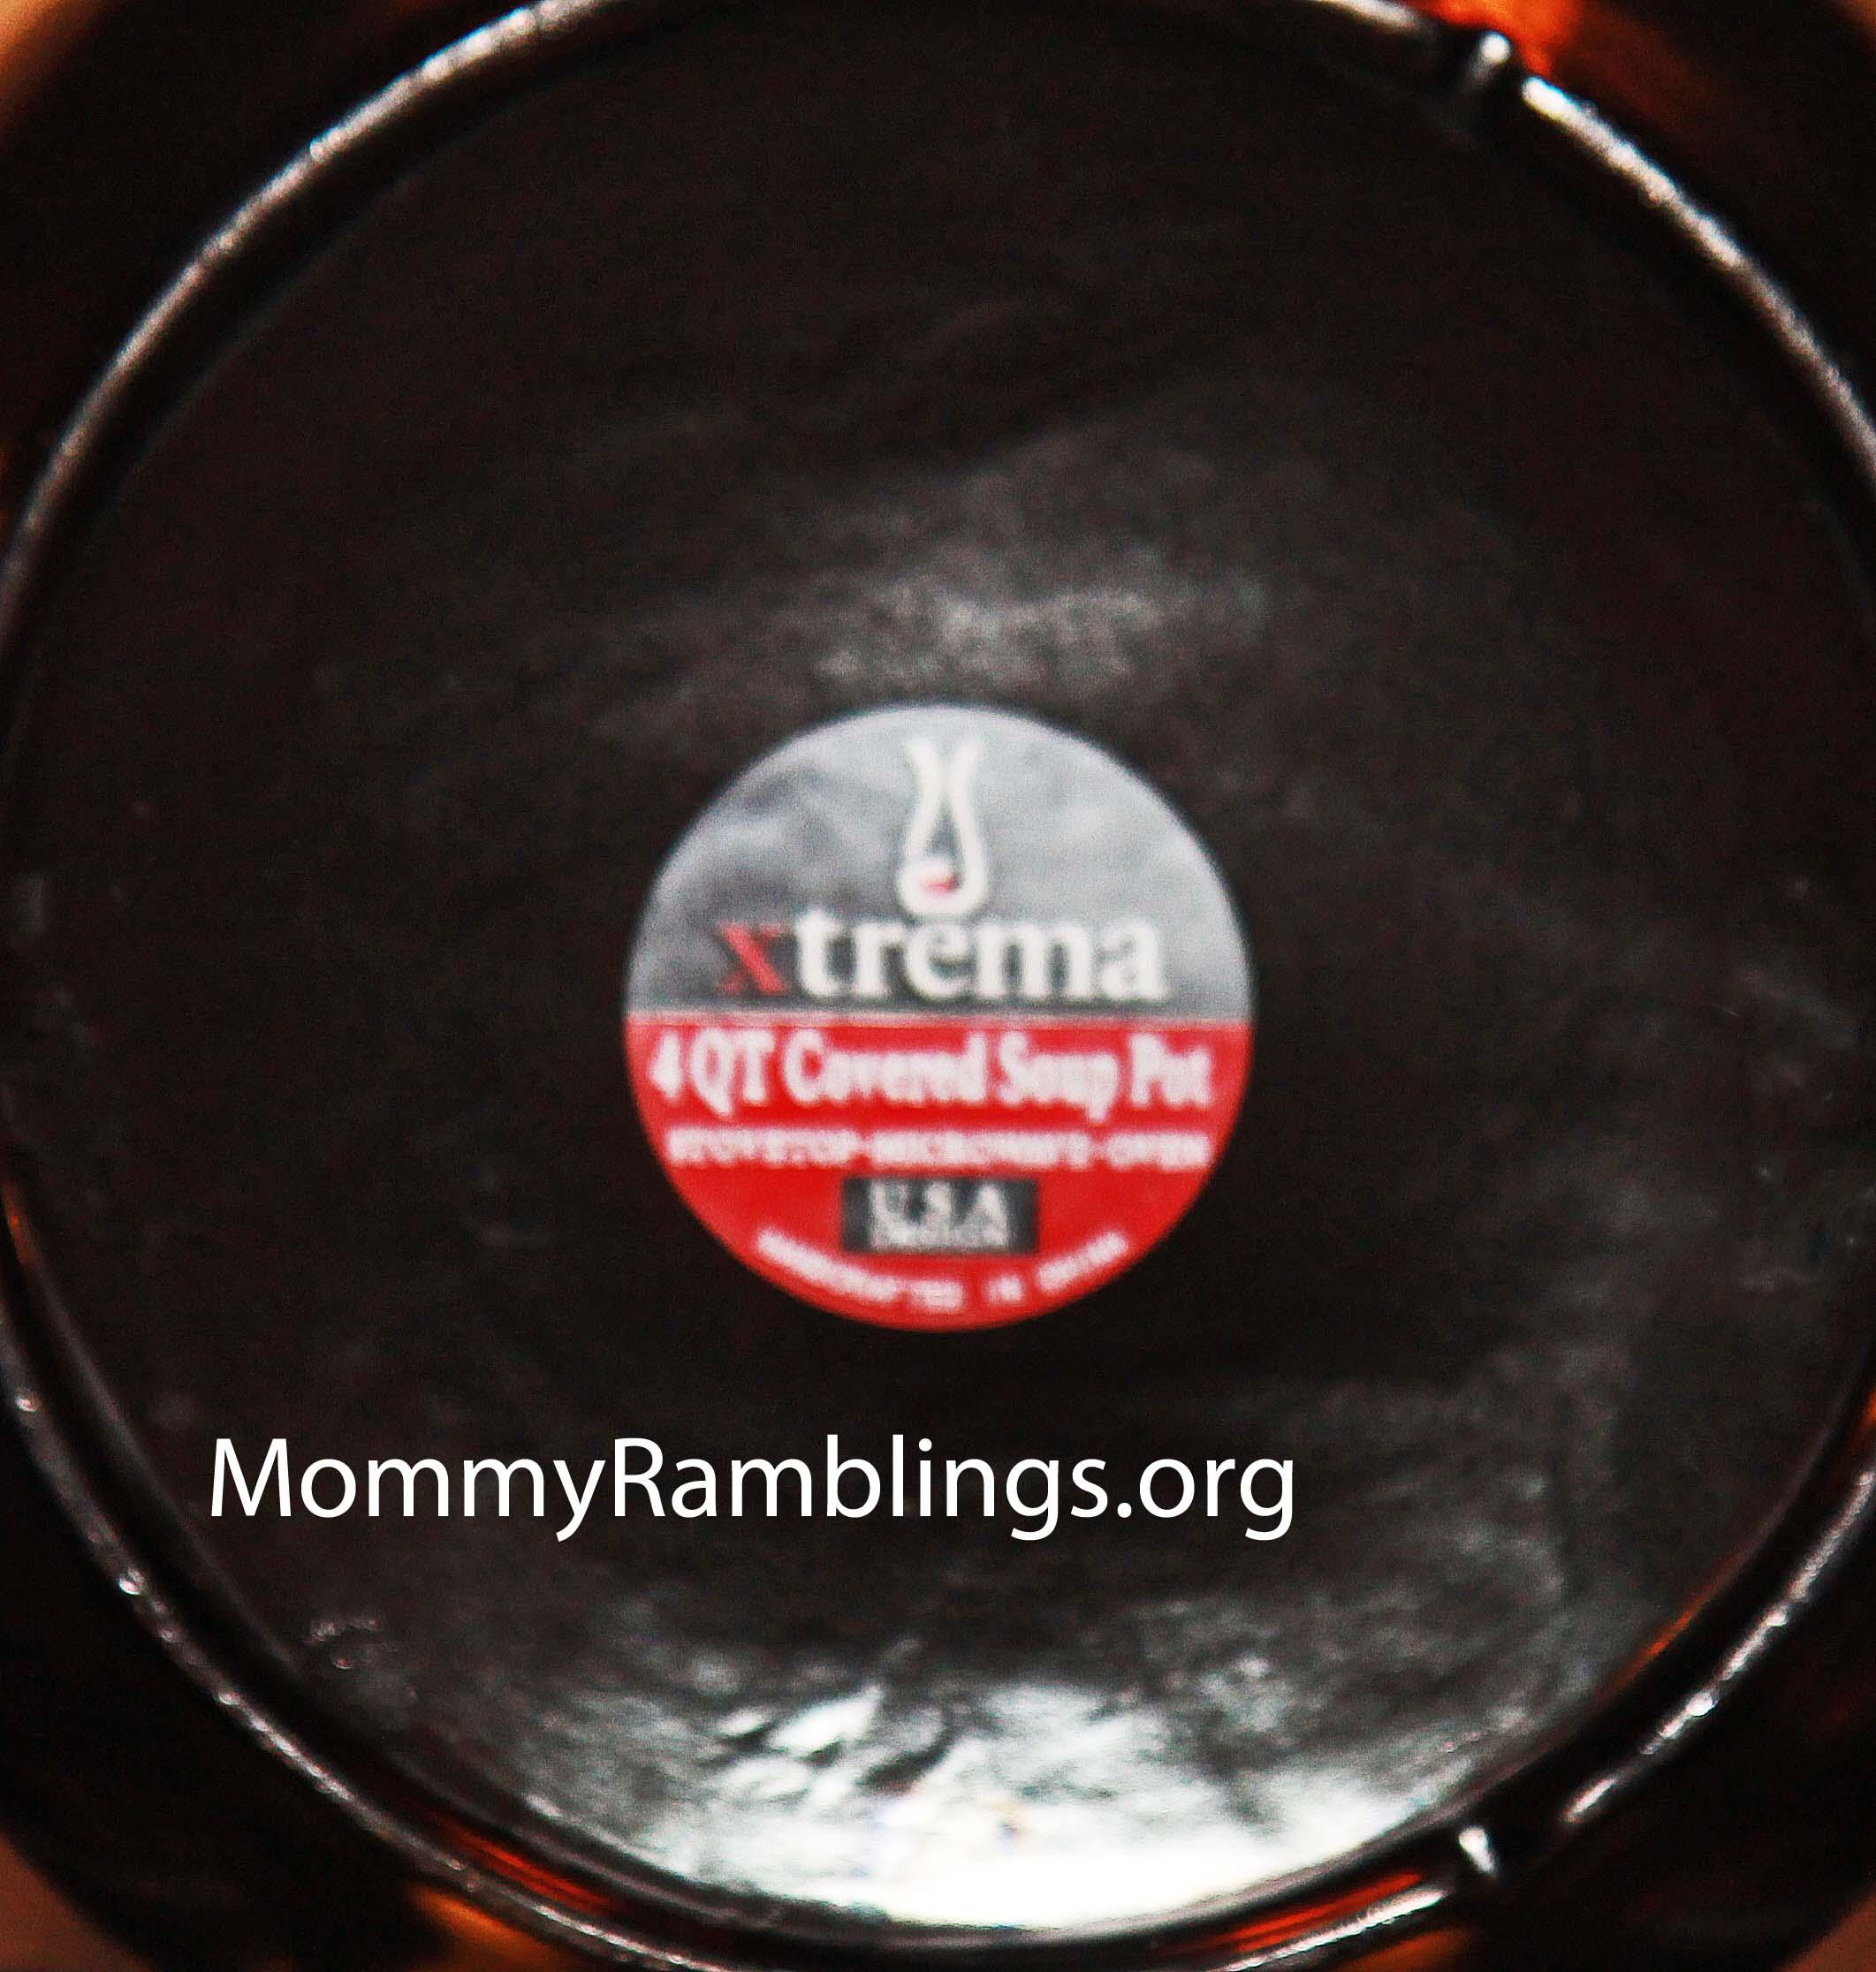 Xtrema 4 Qt 100 Ceramic Covered Sauce Pot Review